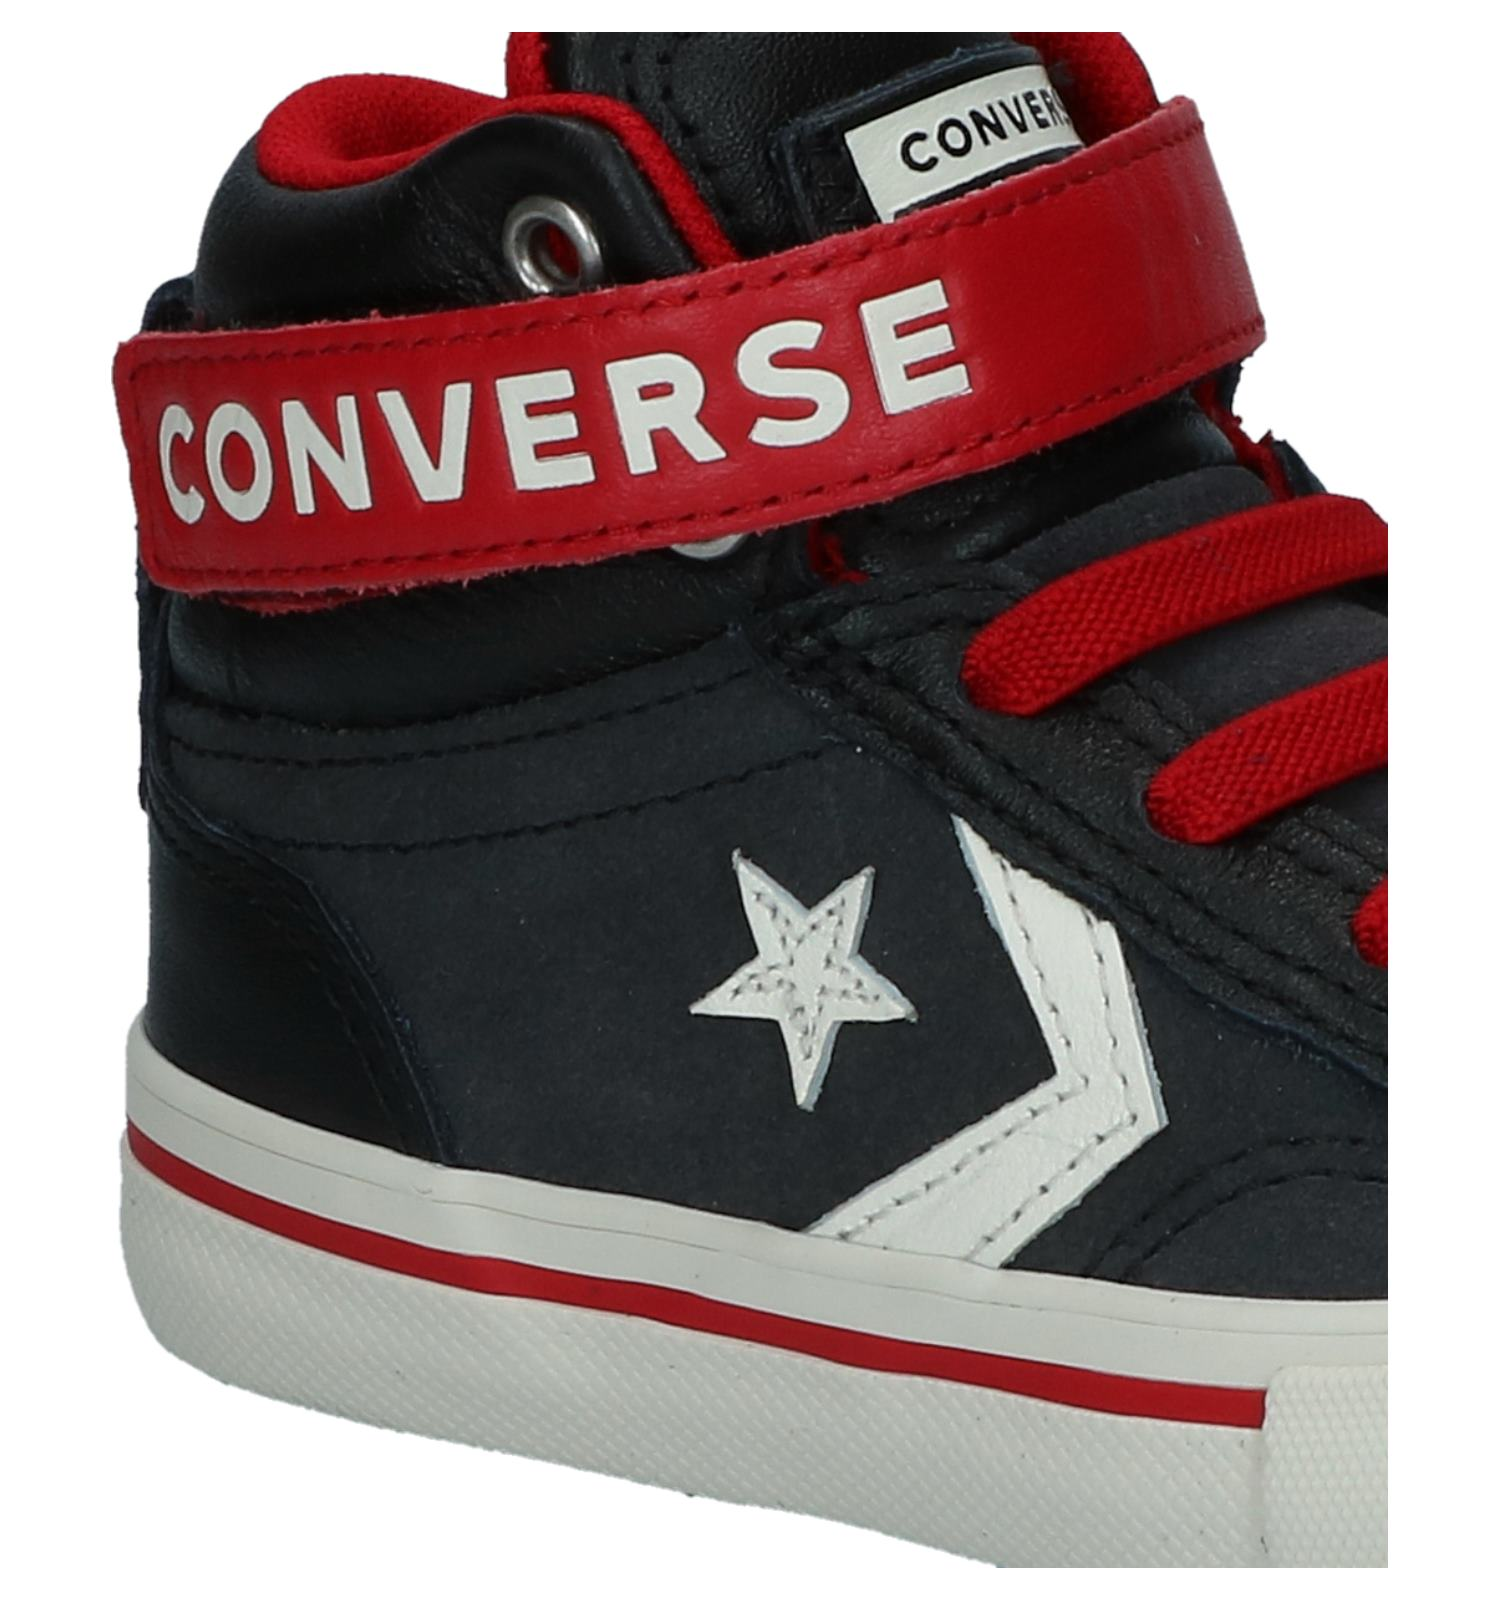 Zwarte Hoge Sneakers Converse Pro Blaze Strap Hi | TORFS.BE